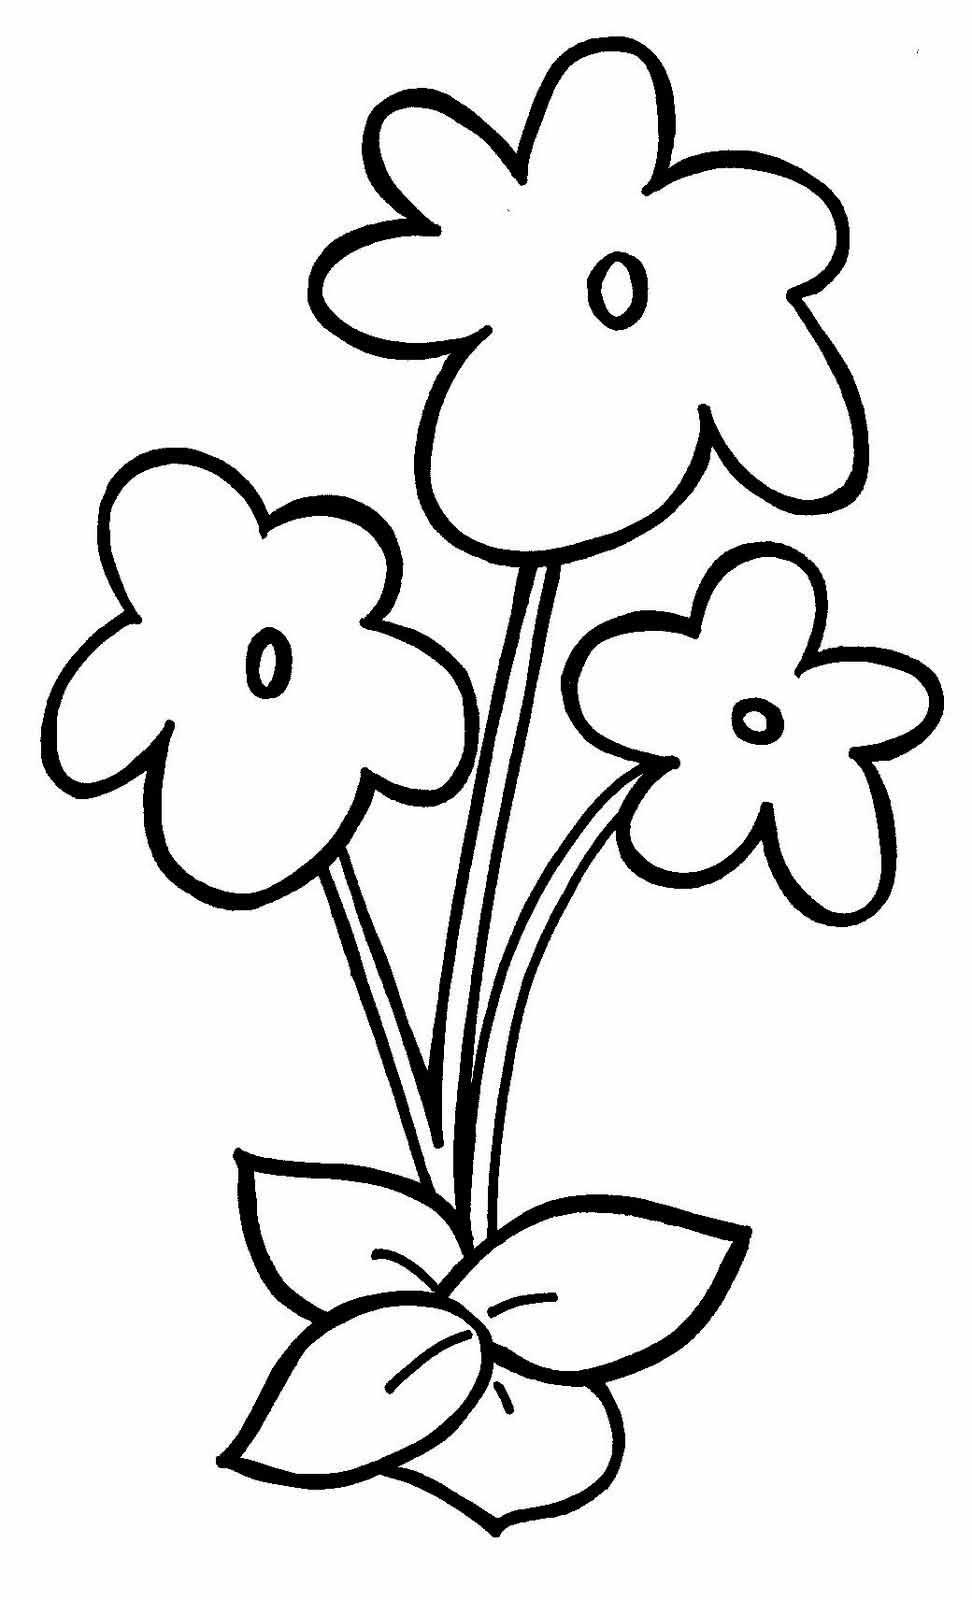 Картинки для раскраски цветочки